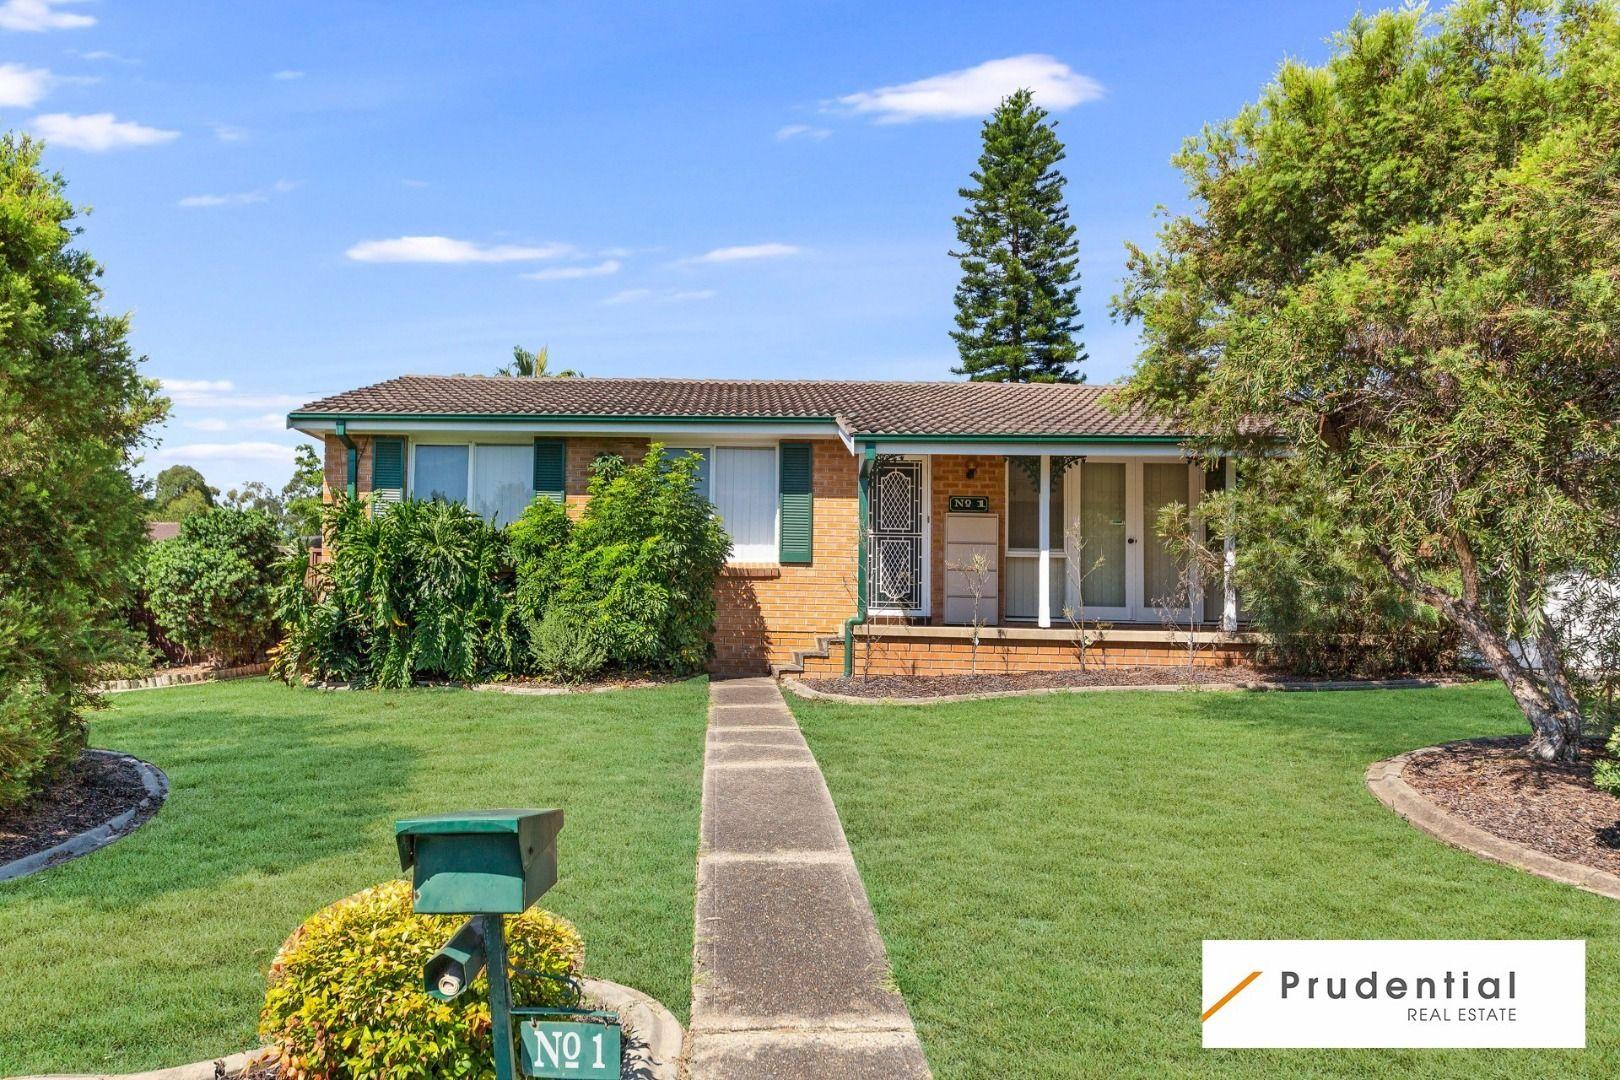 1 Darling Ave, Lurnea NSW 2170, Image 0